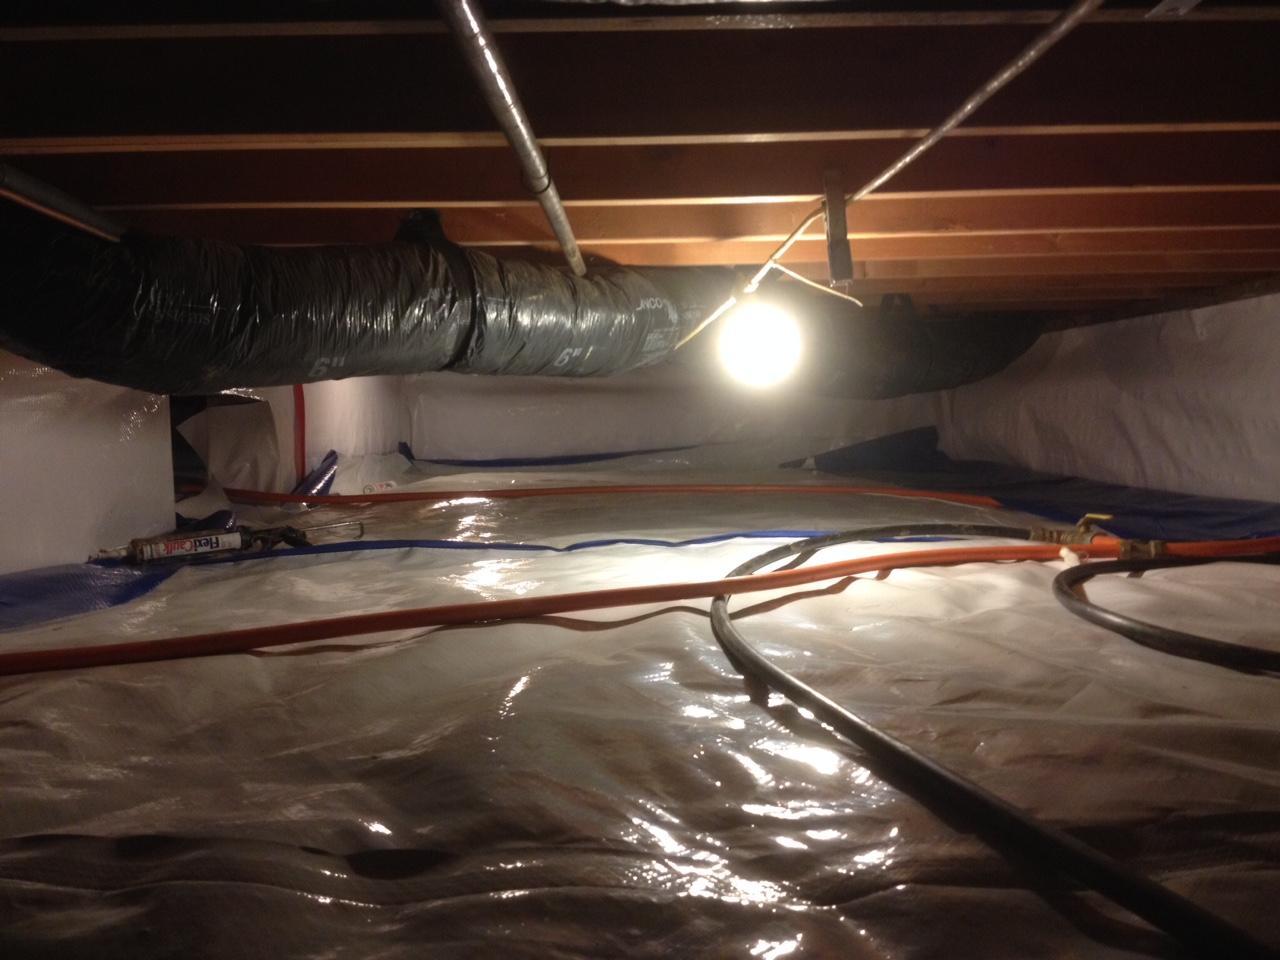 Princeton, IN crawlspace encapsulation complete